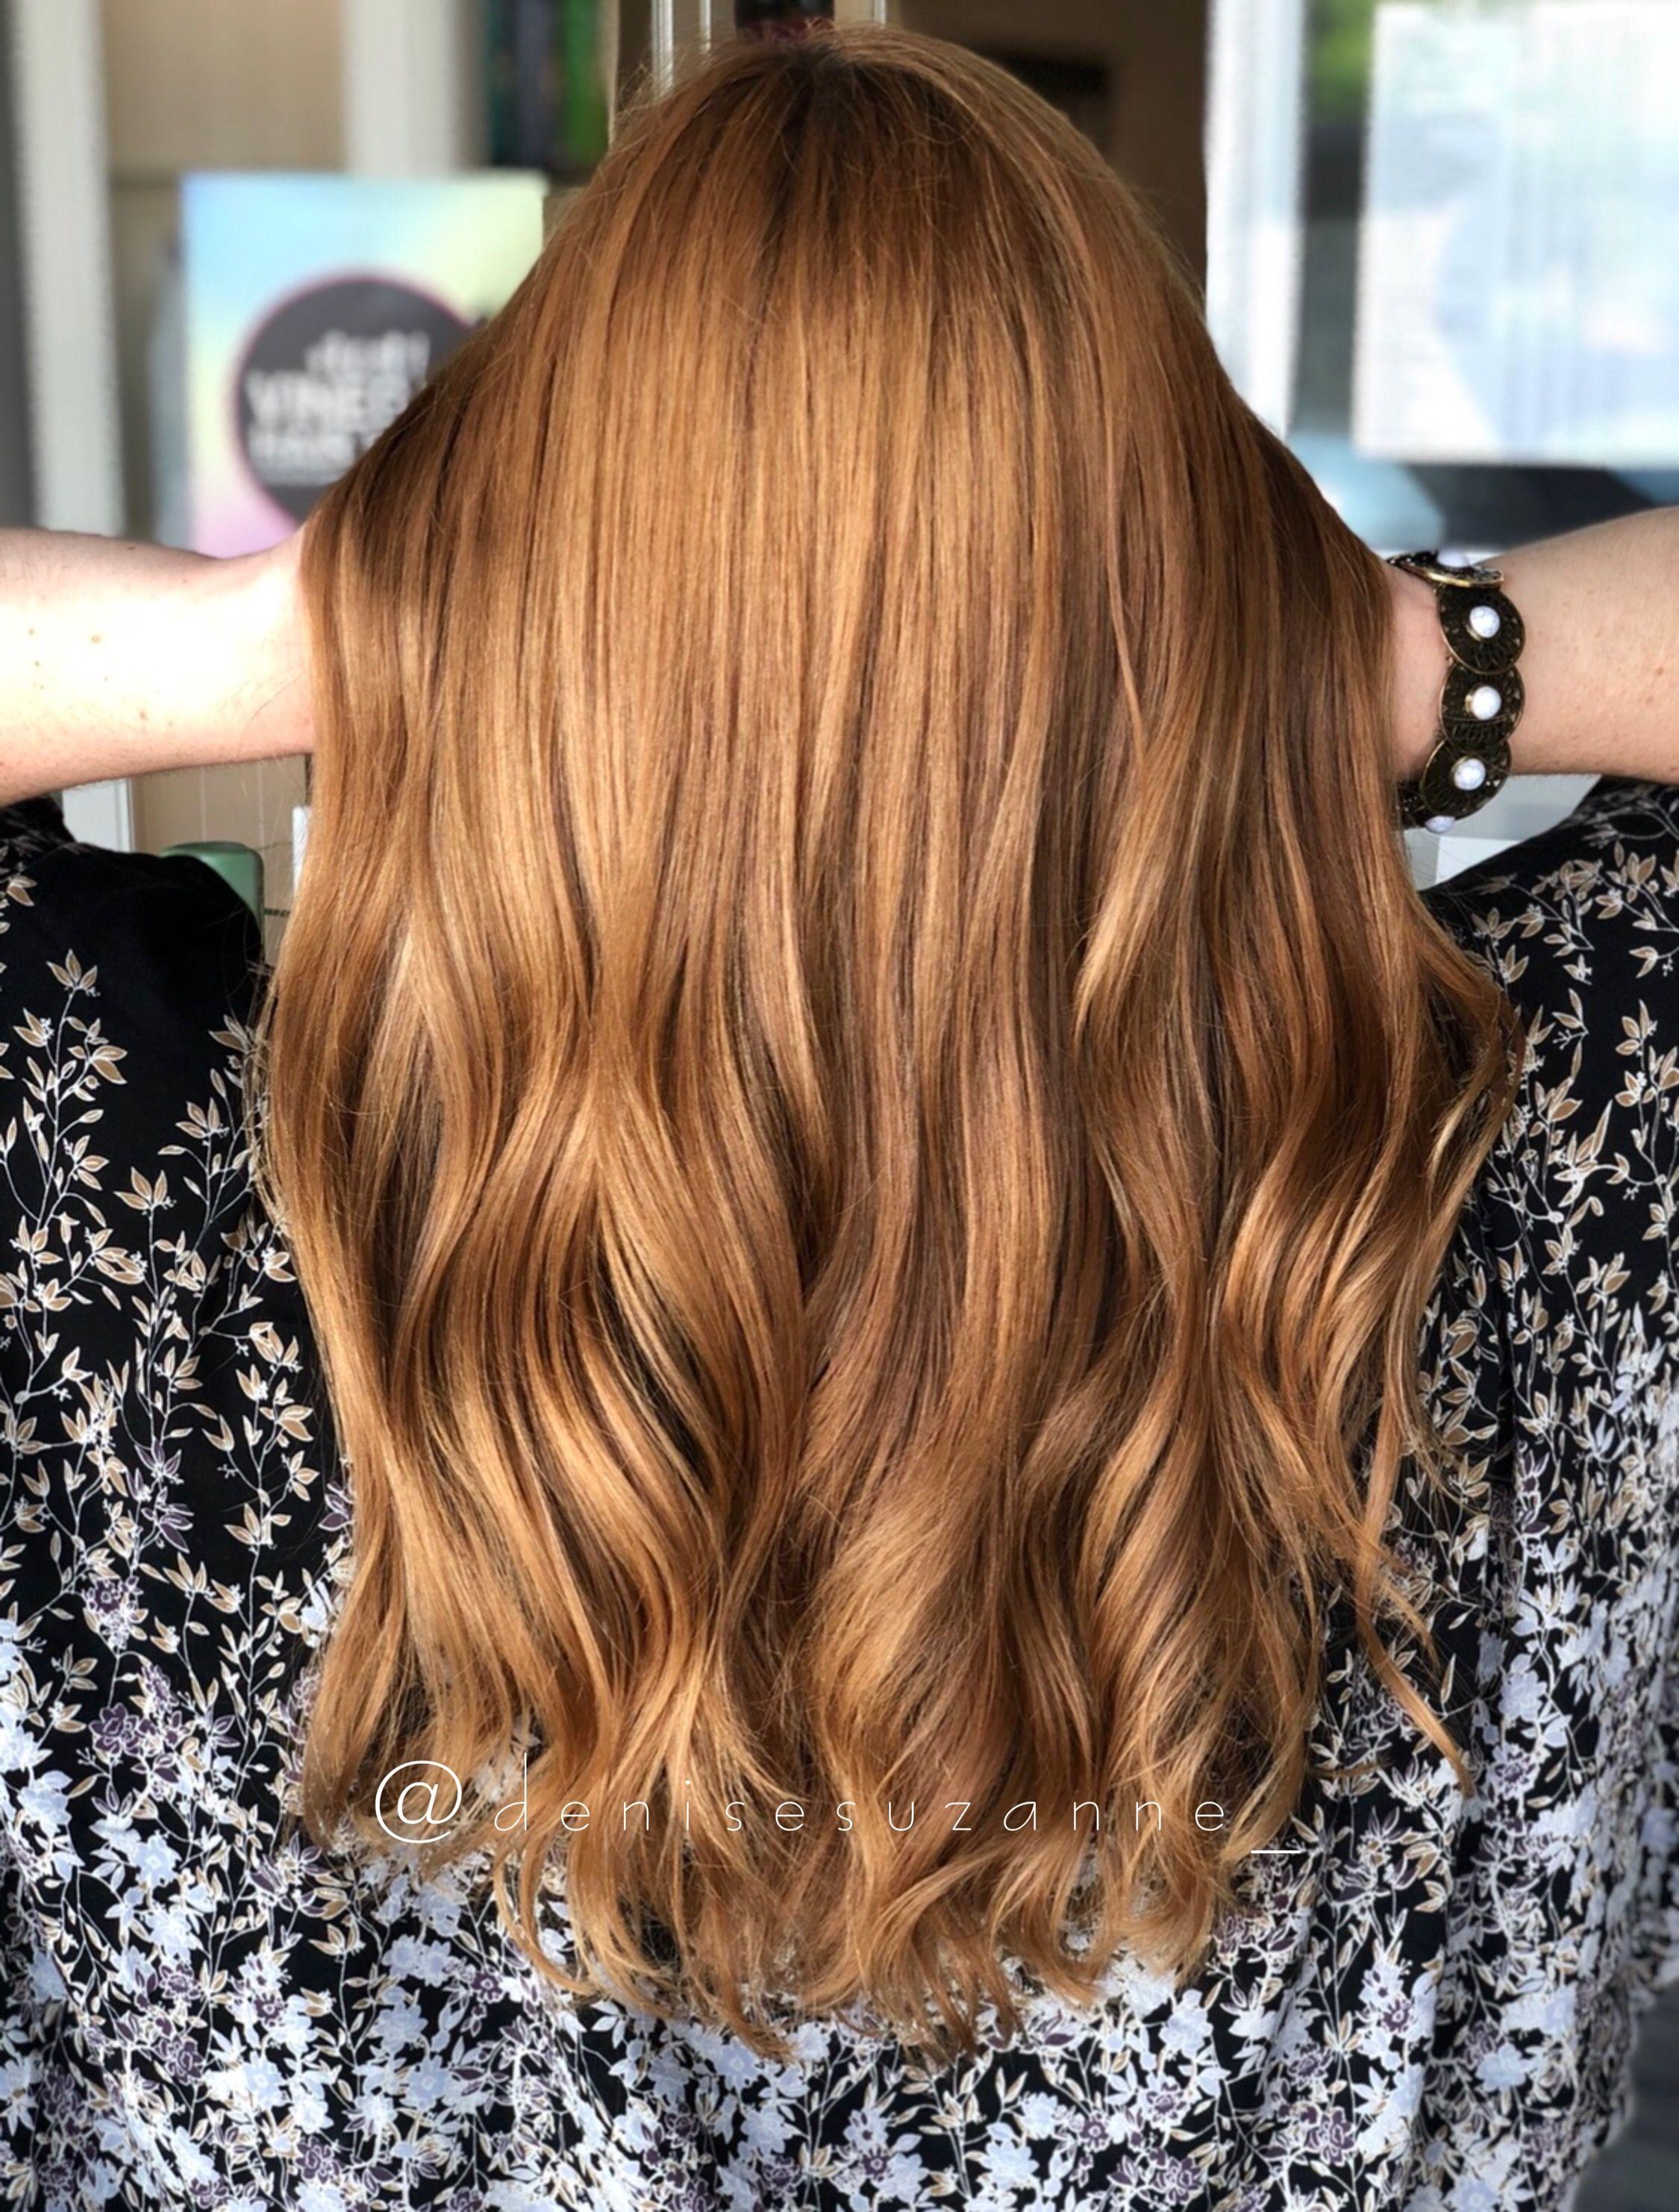 44+ Shades eq strawberry blonde formula trends